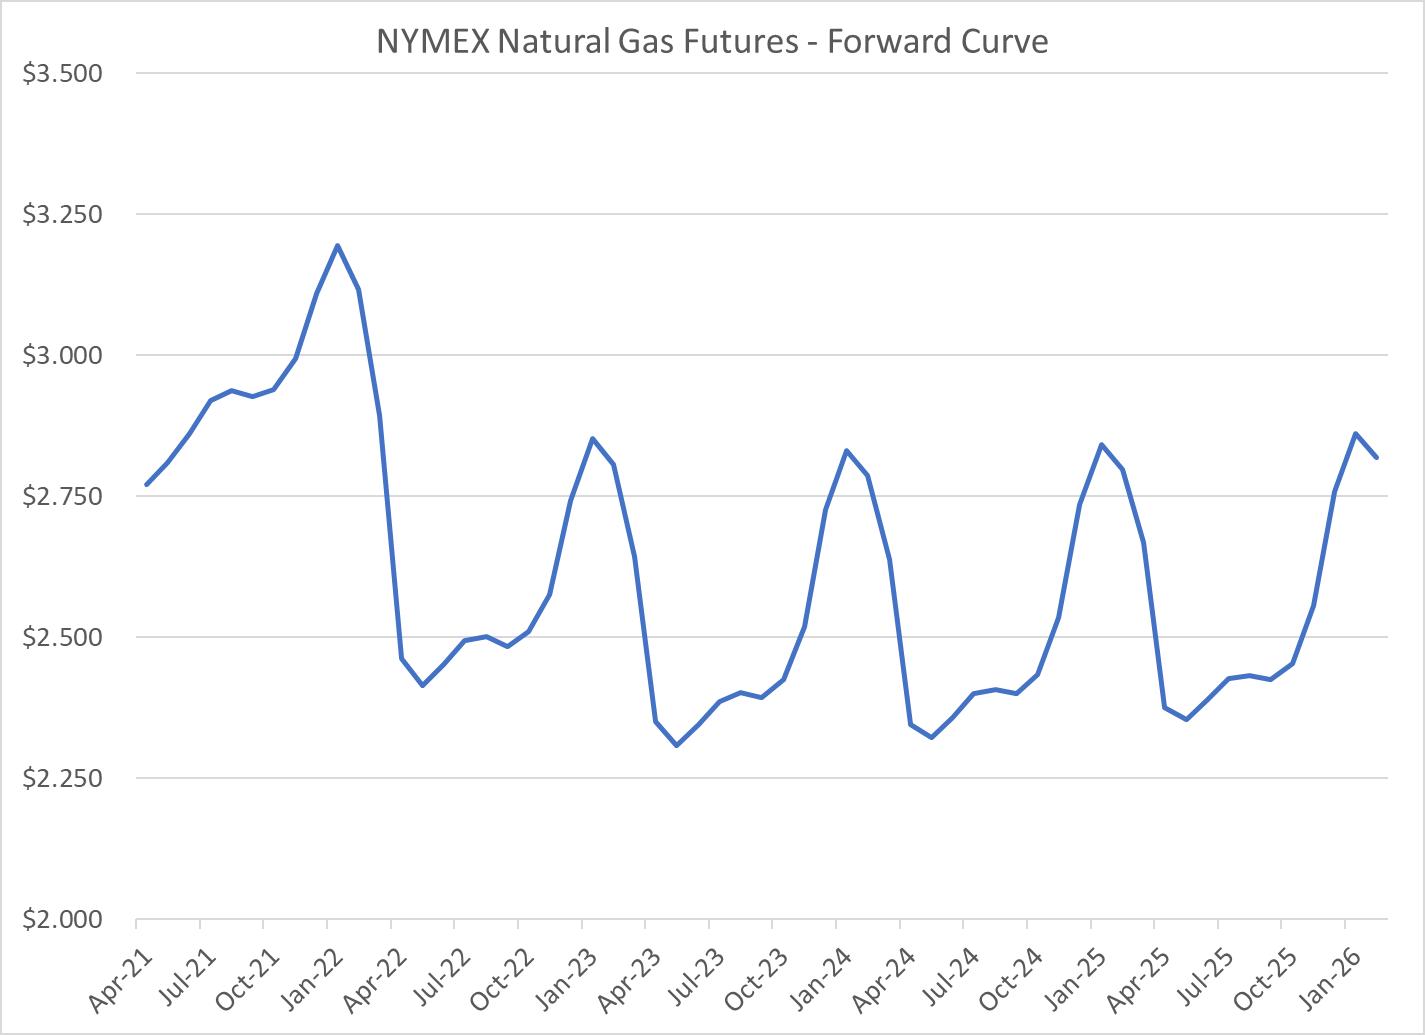 nymex-natural-gas-futures-forward-curve-chart